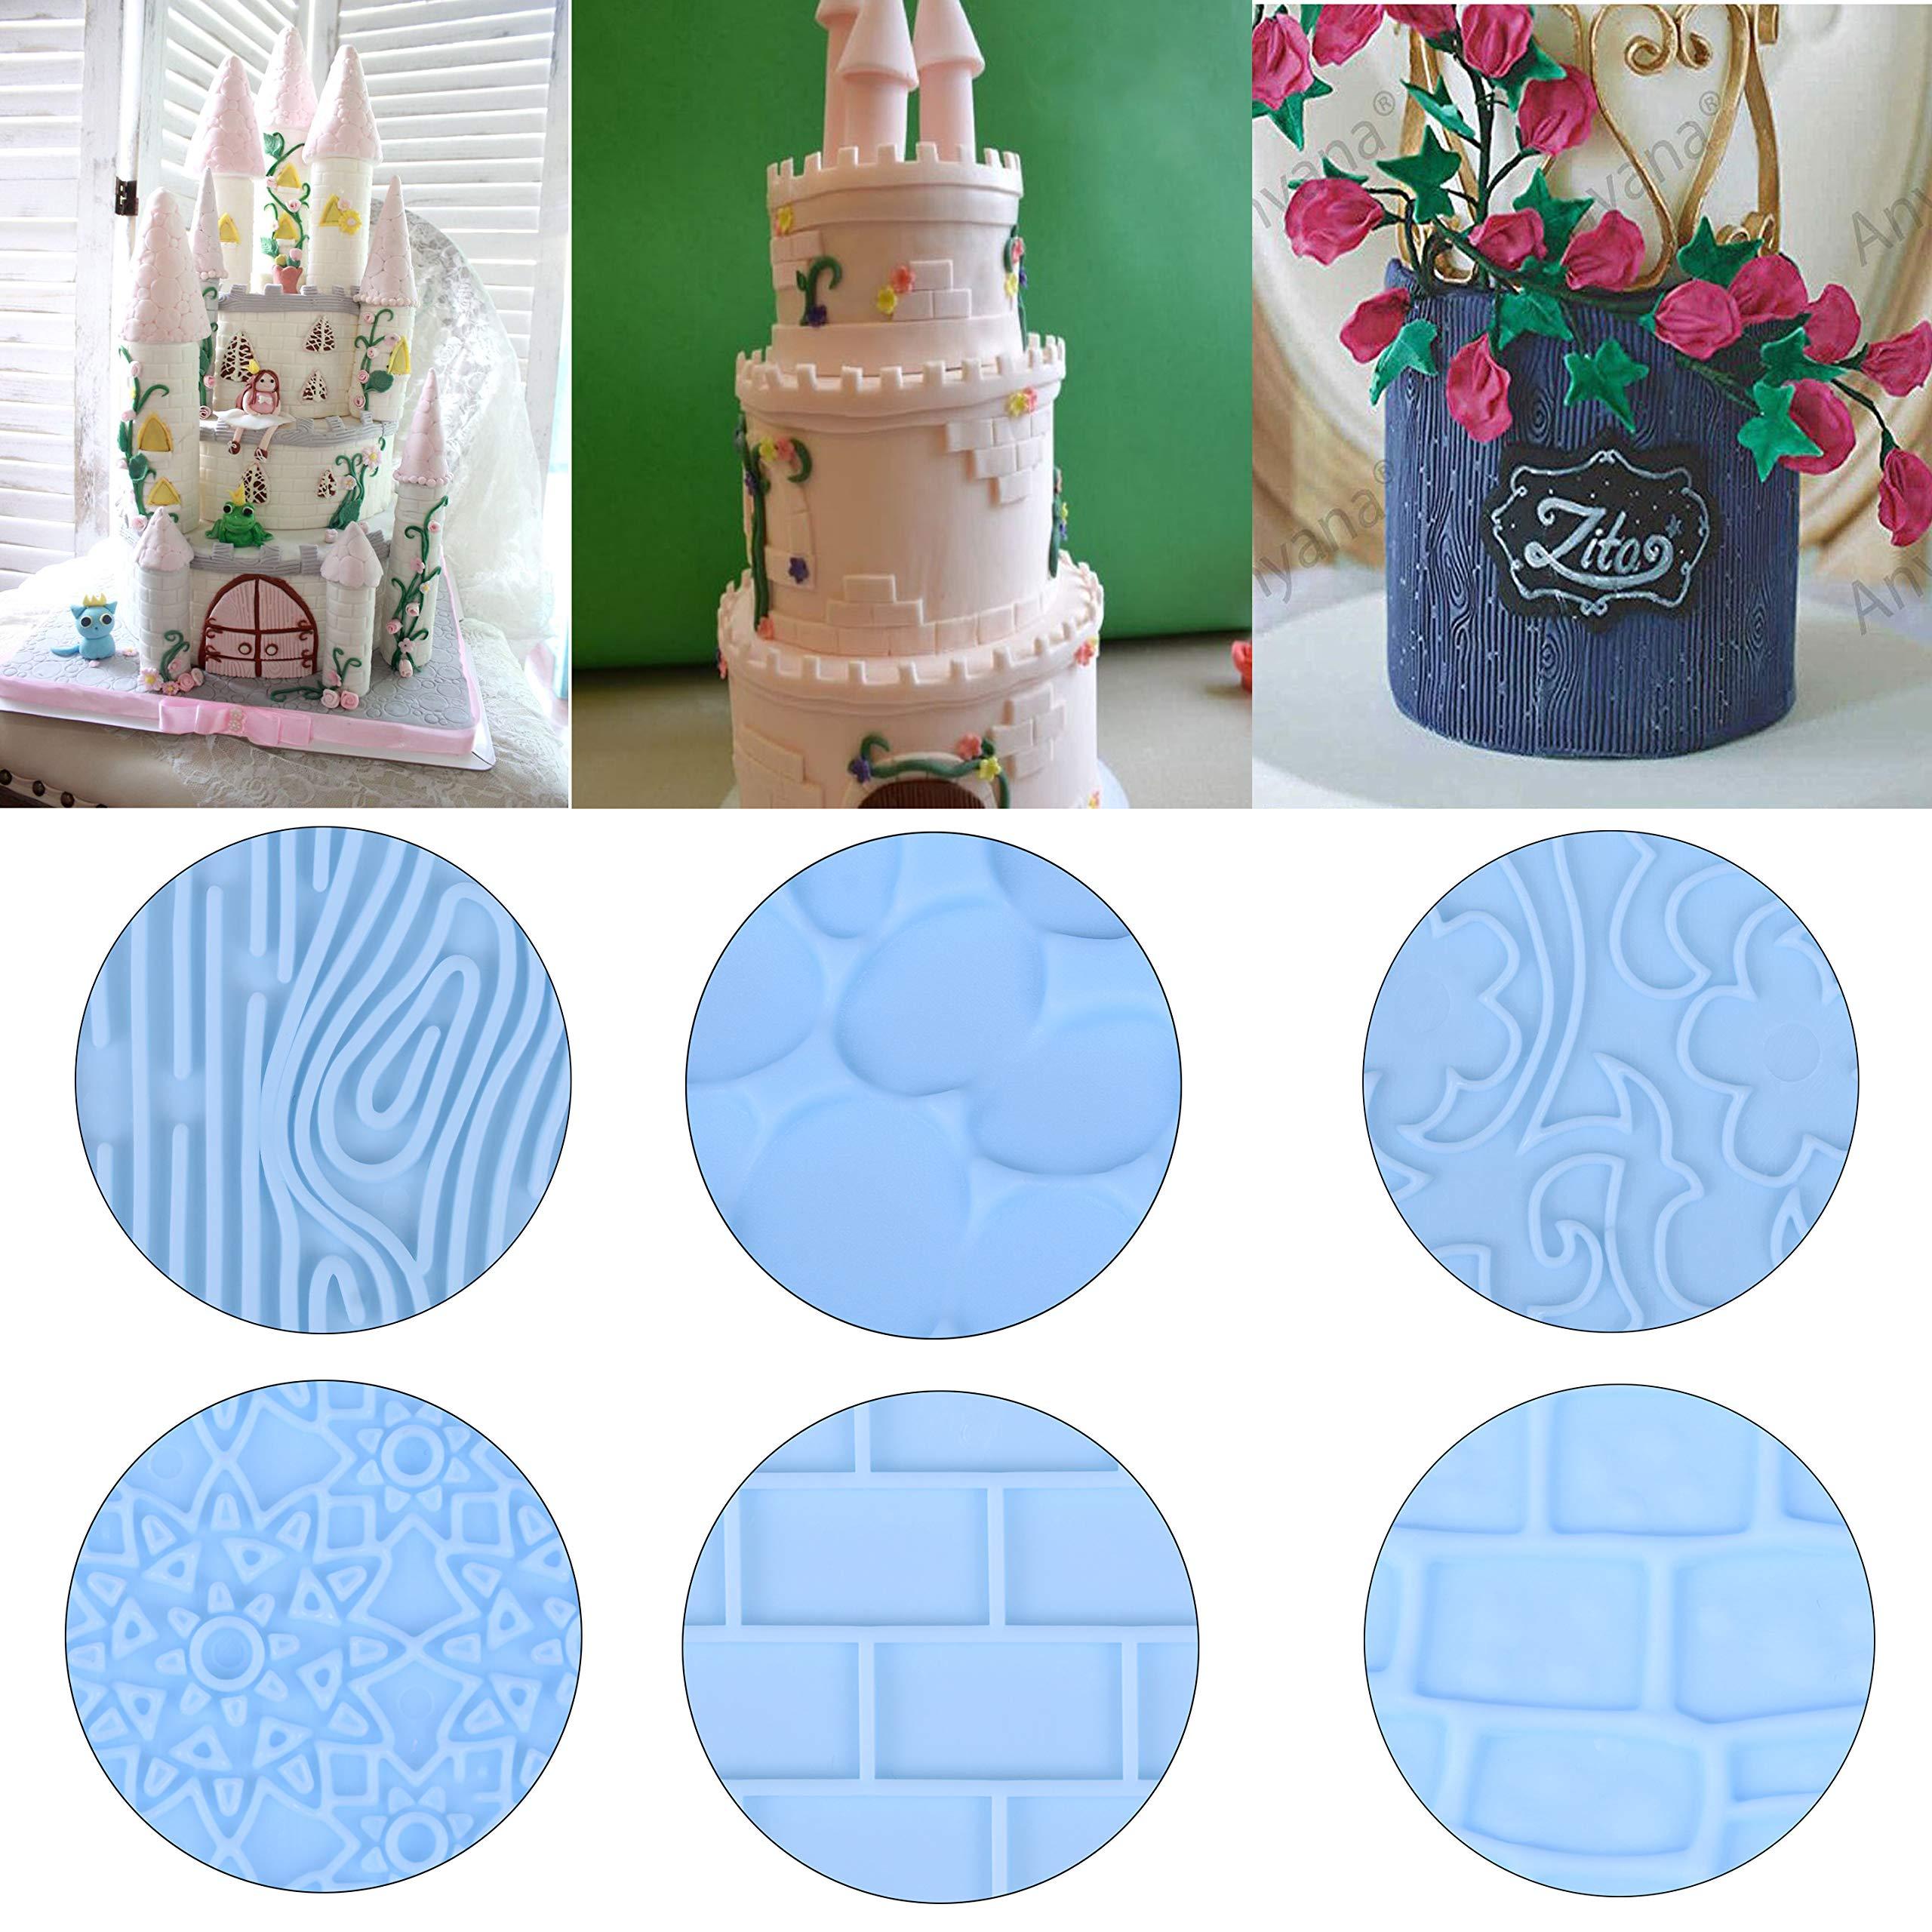 Xgood 6 Pcs Fondant Impression Mat Set Cake Decor Mold Set-Embossed Tree Bark/Flower/Cobblestone Texture Design Sugarcraft Decor Tool for Cupcake Top Decoration by Xgood (Image #6)